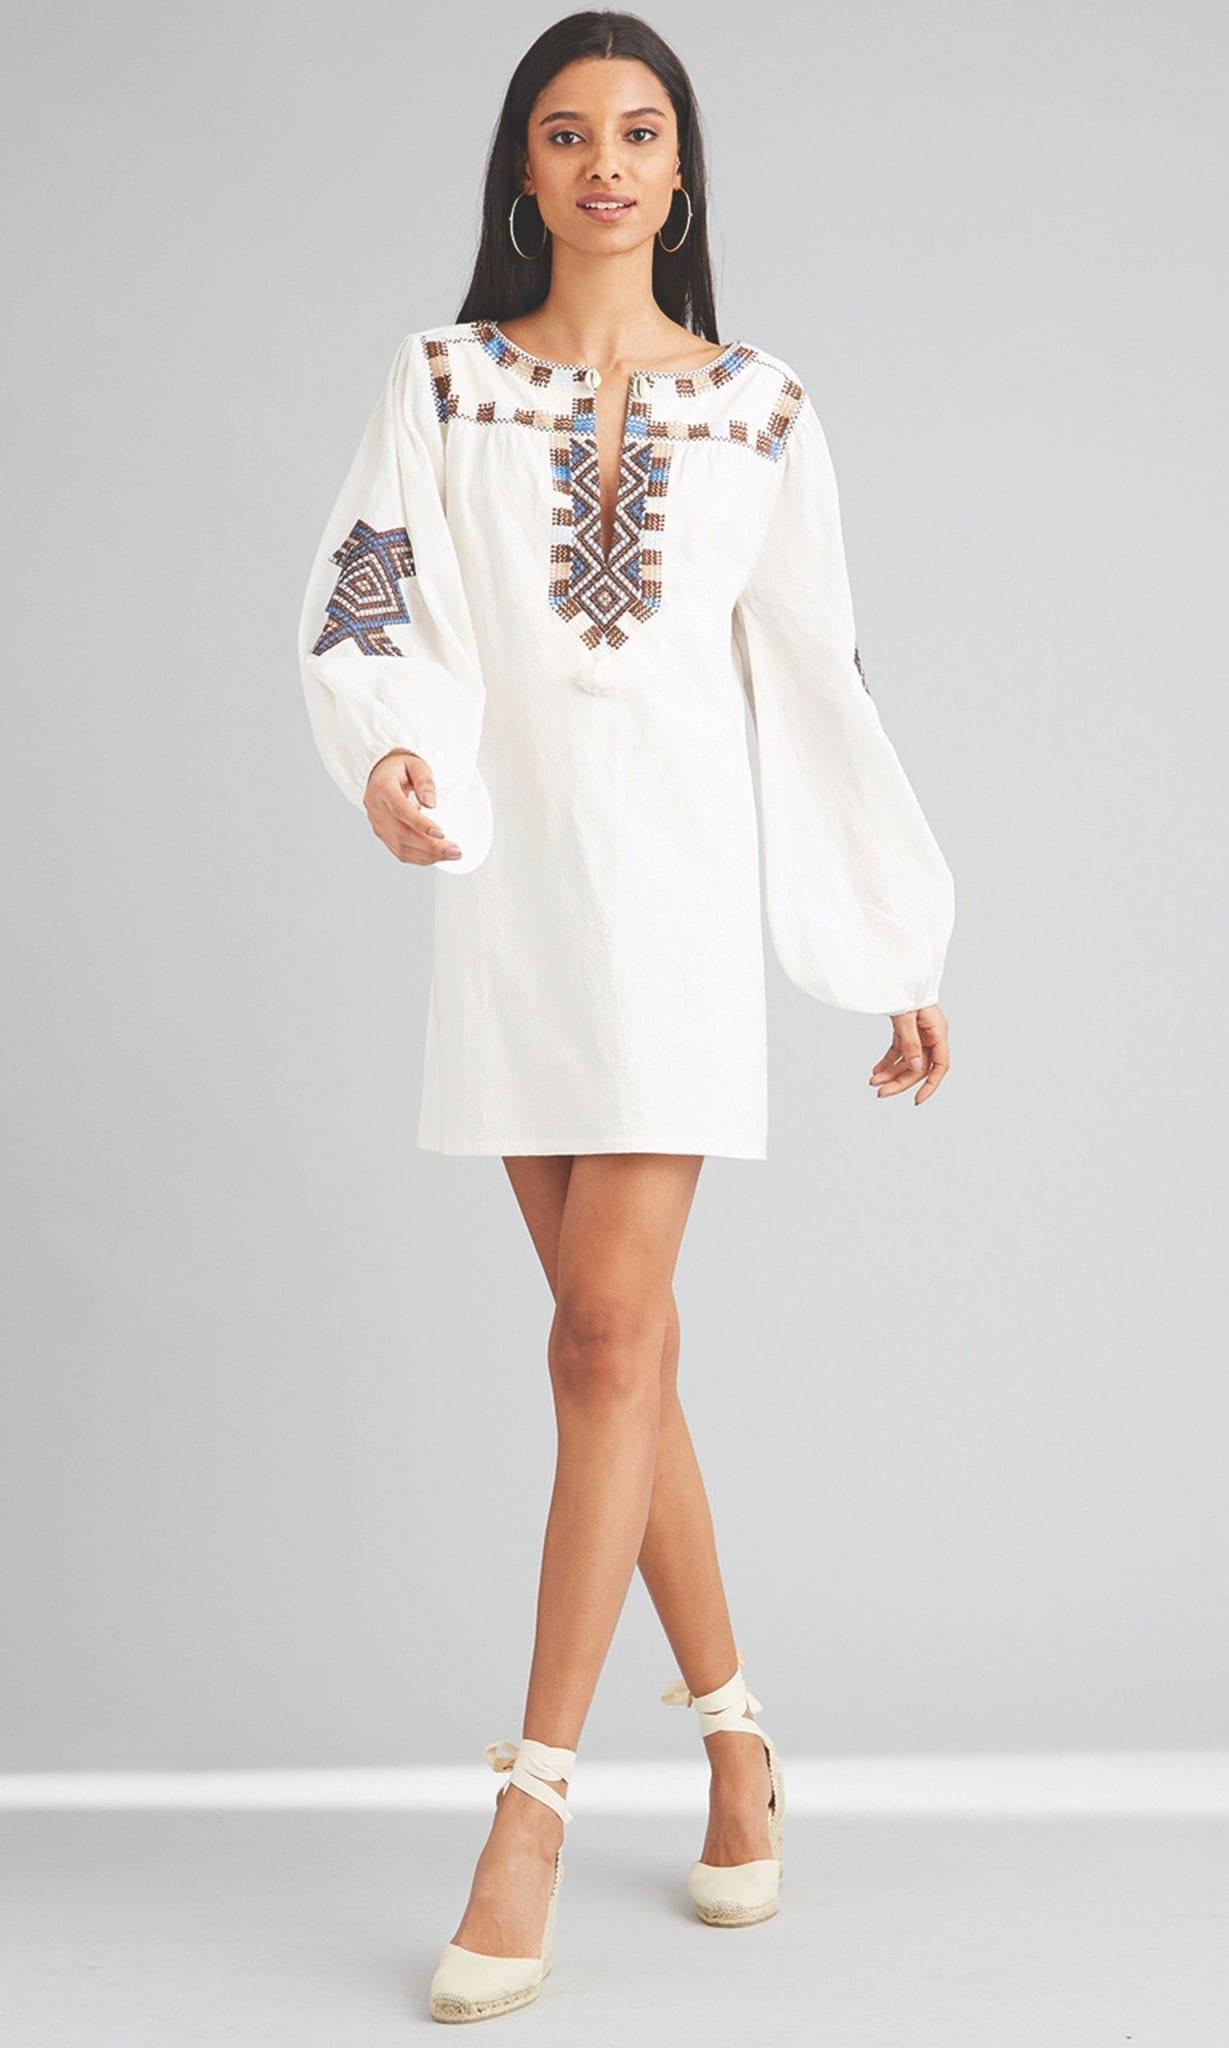 FIGUE Nara Cotton V-Neck Tunic Dress